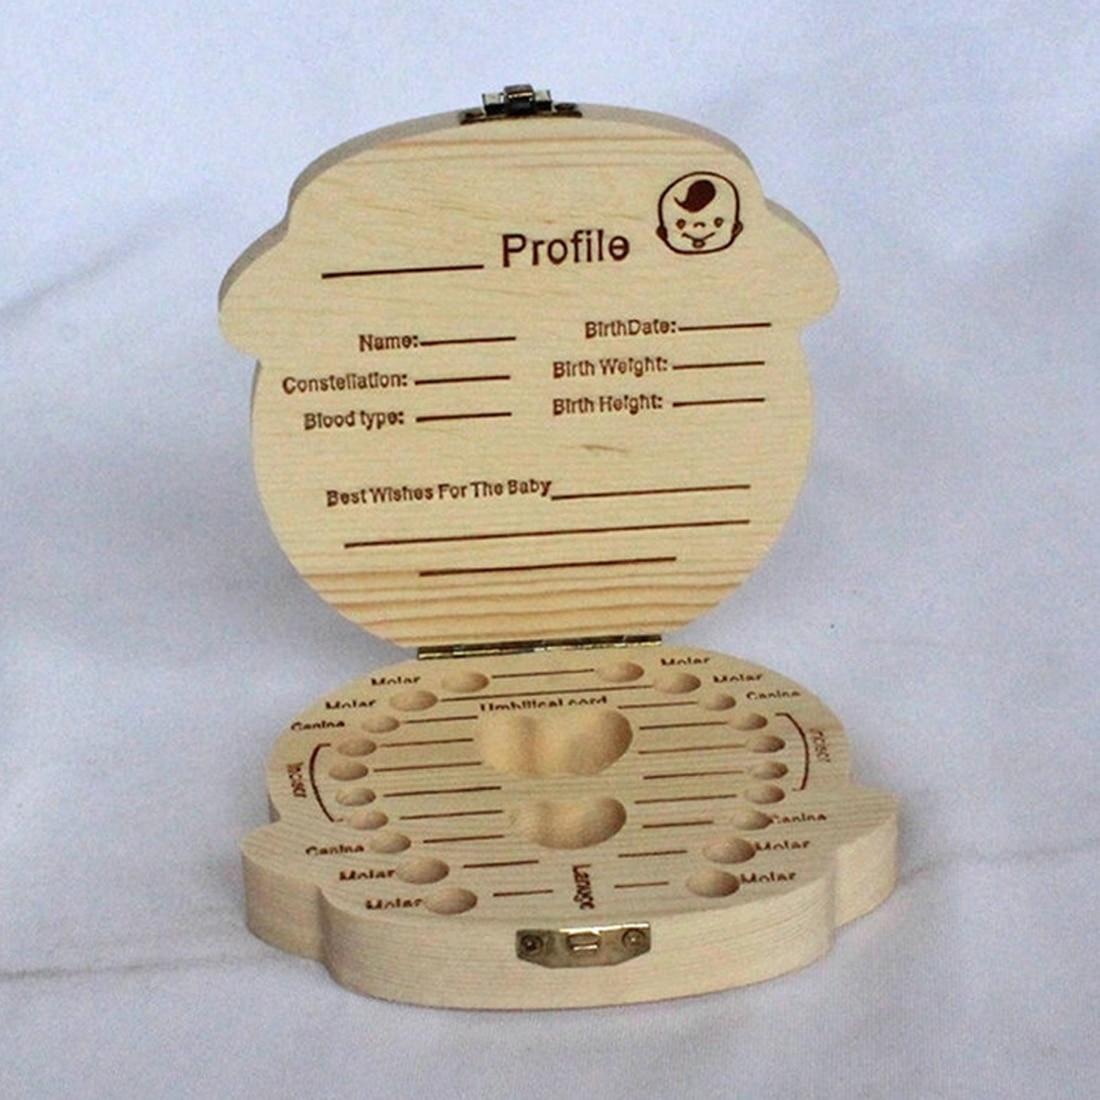 English Spanish Wooden Box Tooth Box Organizer Save Milk Teeth Box Storage Teeth Gift Umbilical Cord Lanugo Wood Storage Box